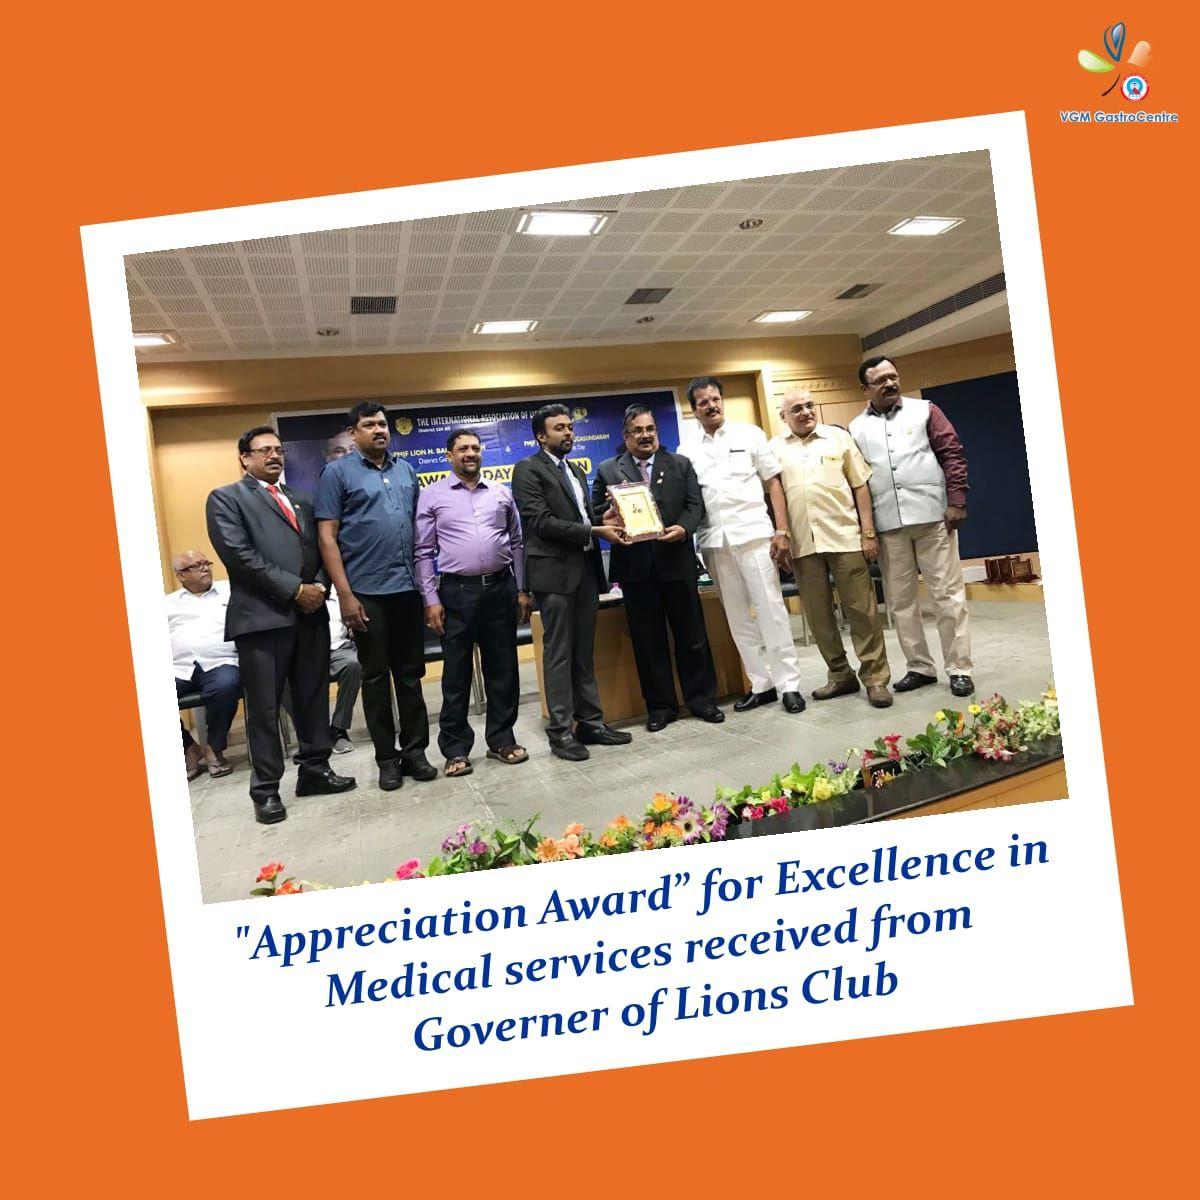 VGM Gastro Centre & MultiSpeciality Hospital heartily